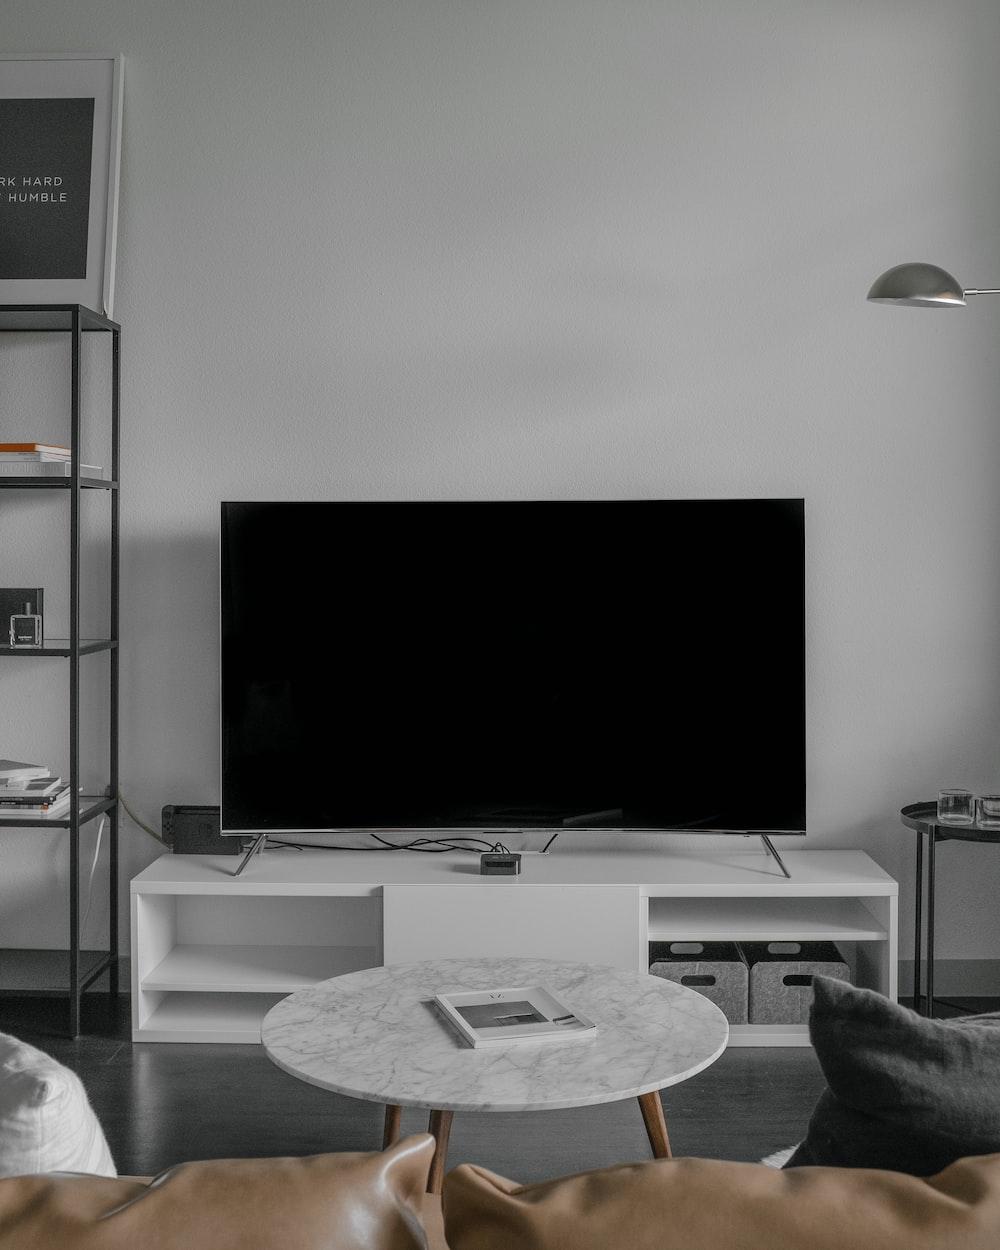 flat screen TV displaying black screen